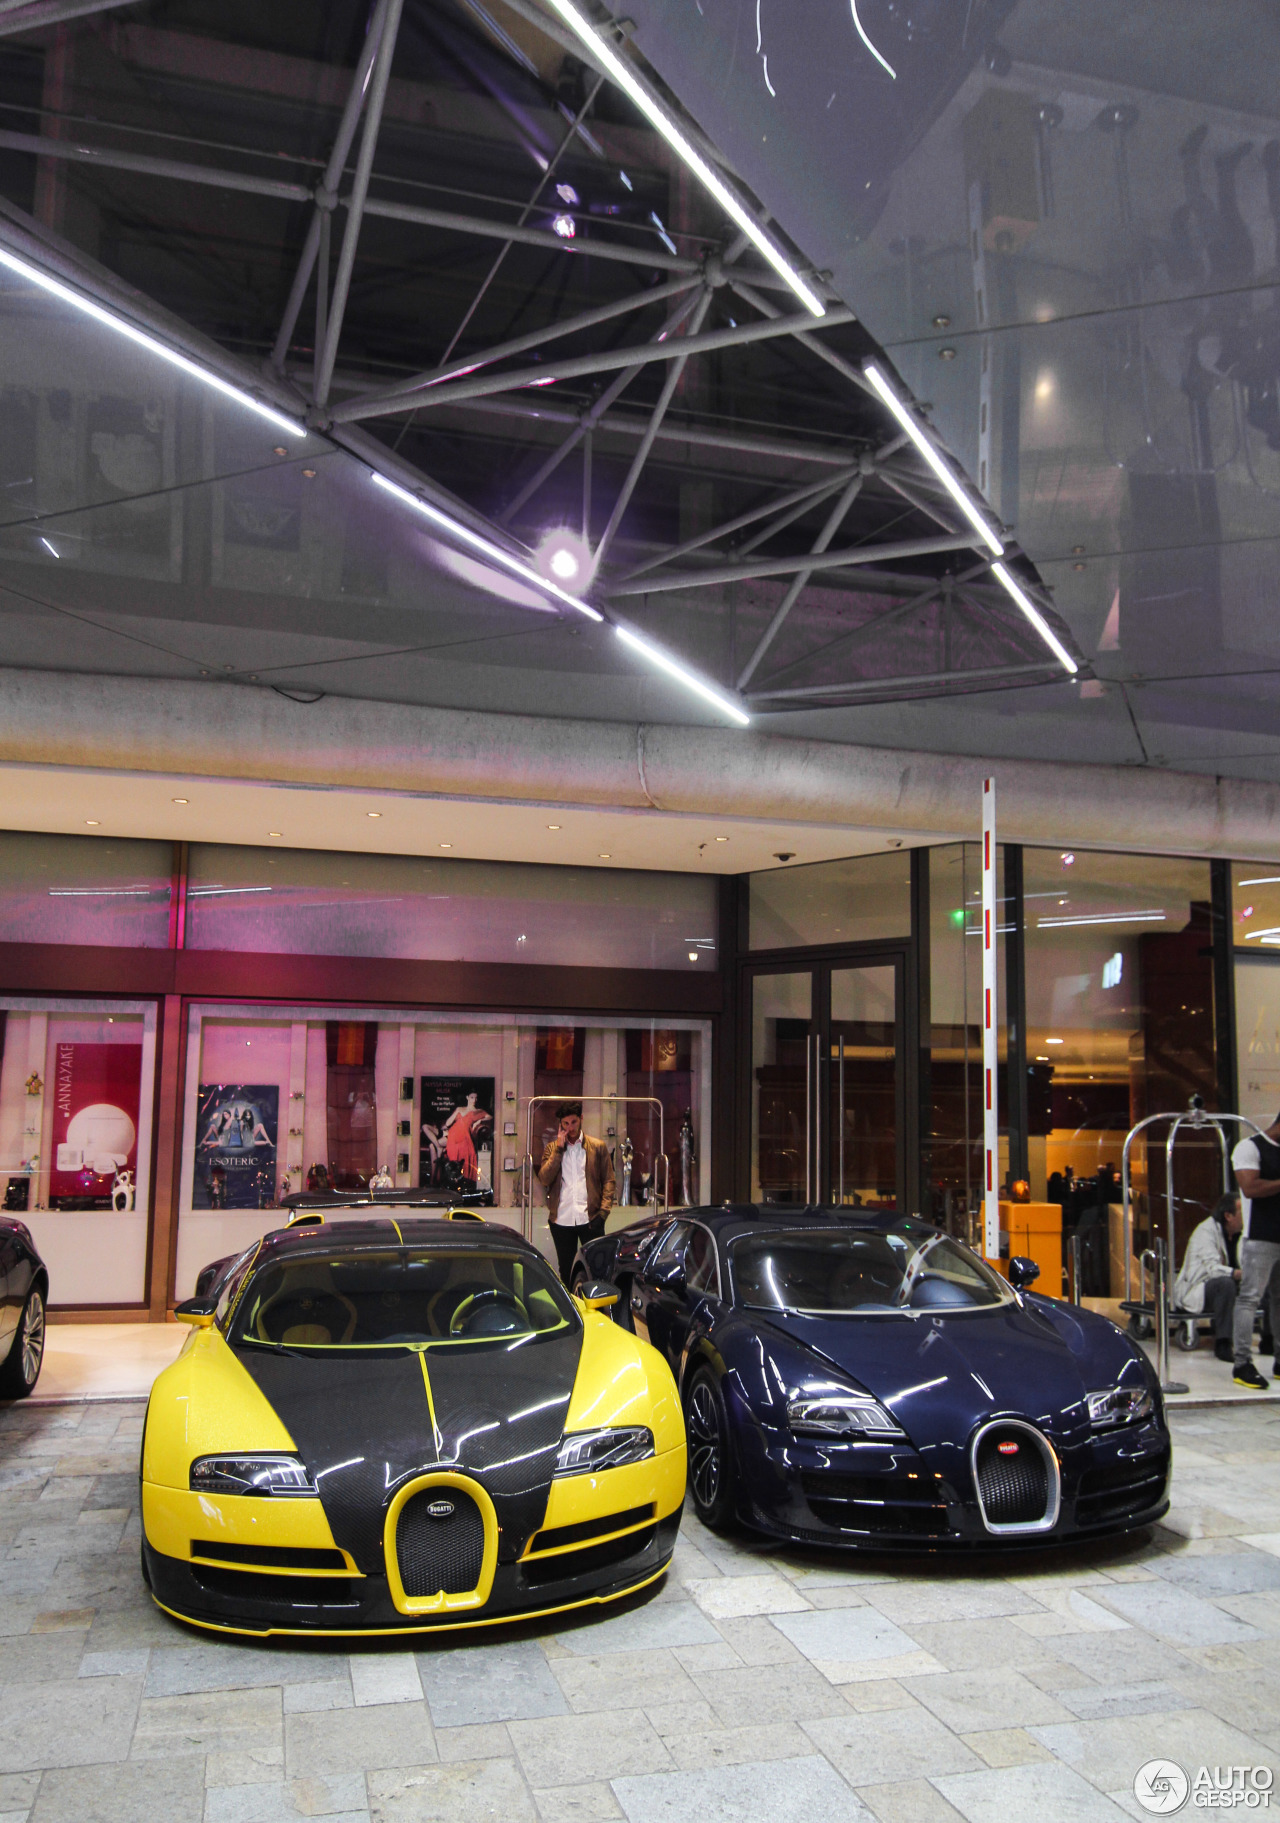 bugatti-veyron-164-super-sport-c528727012017000234_5 Stunning Bugatti Veyron Price In Brazil Cars Trend